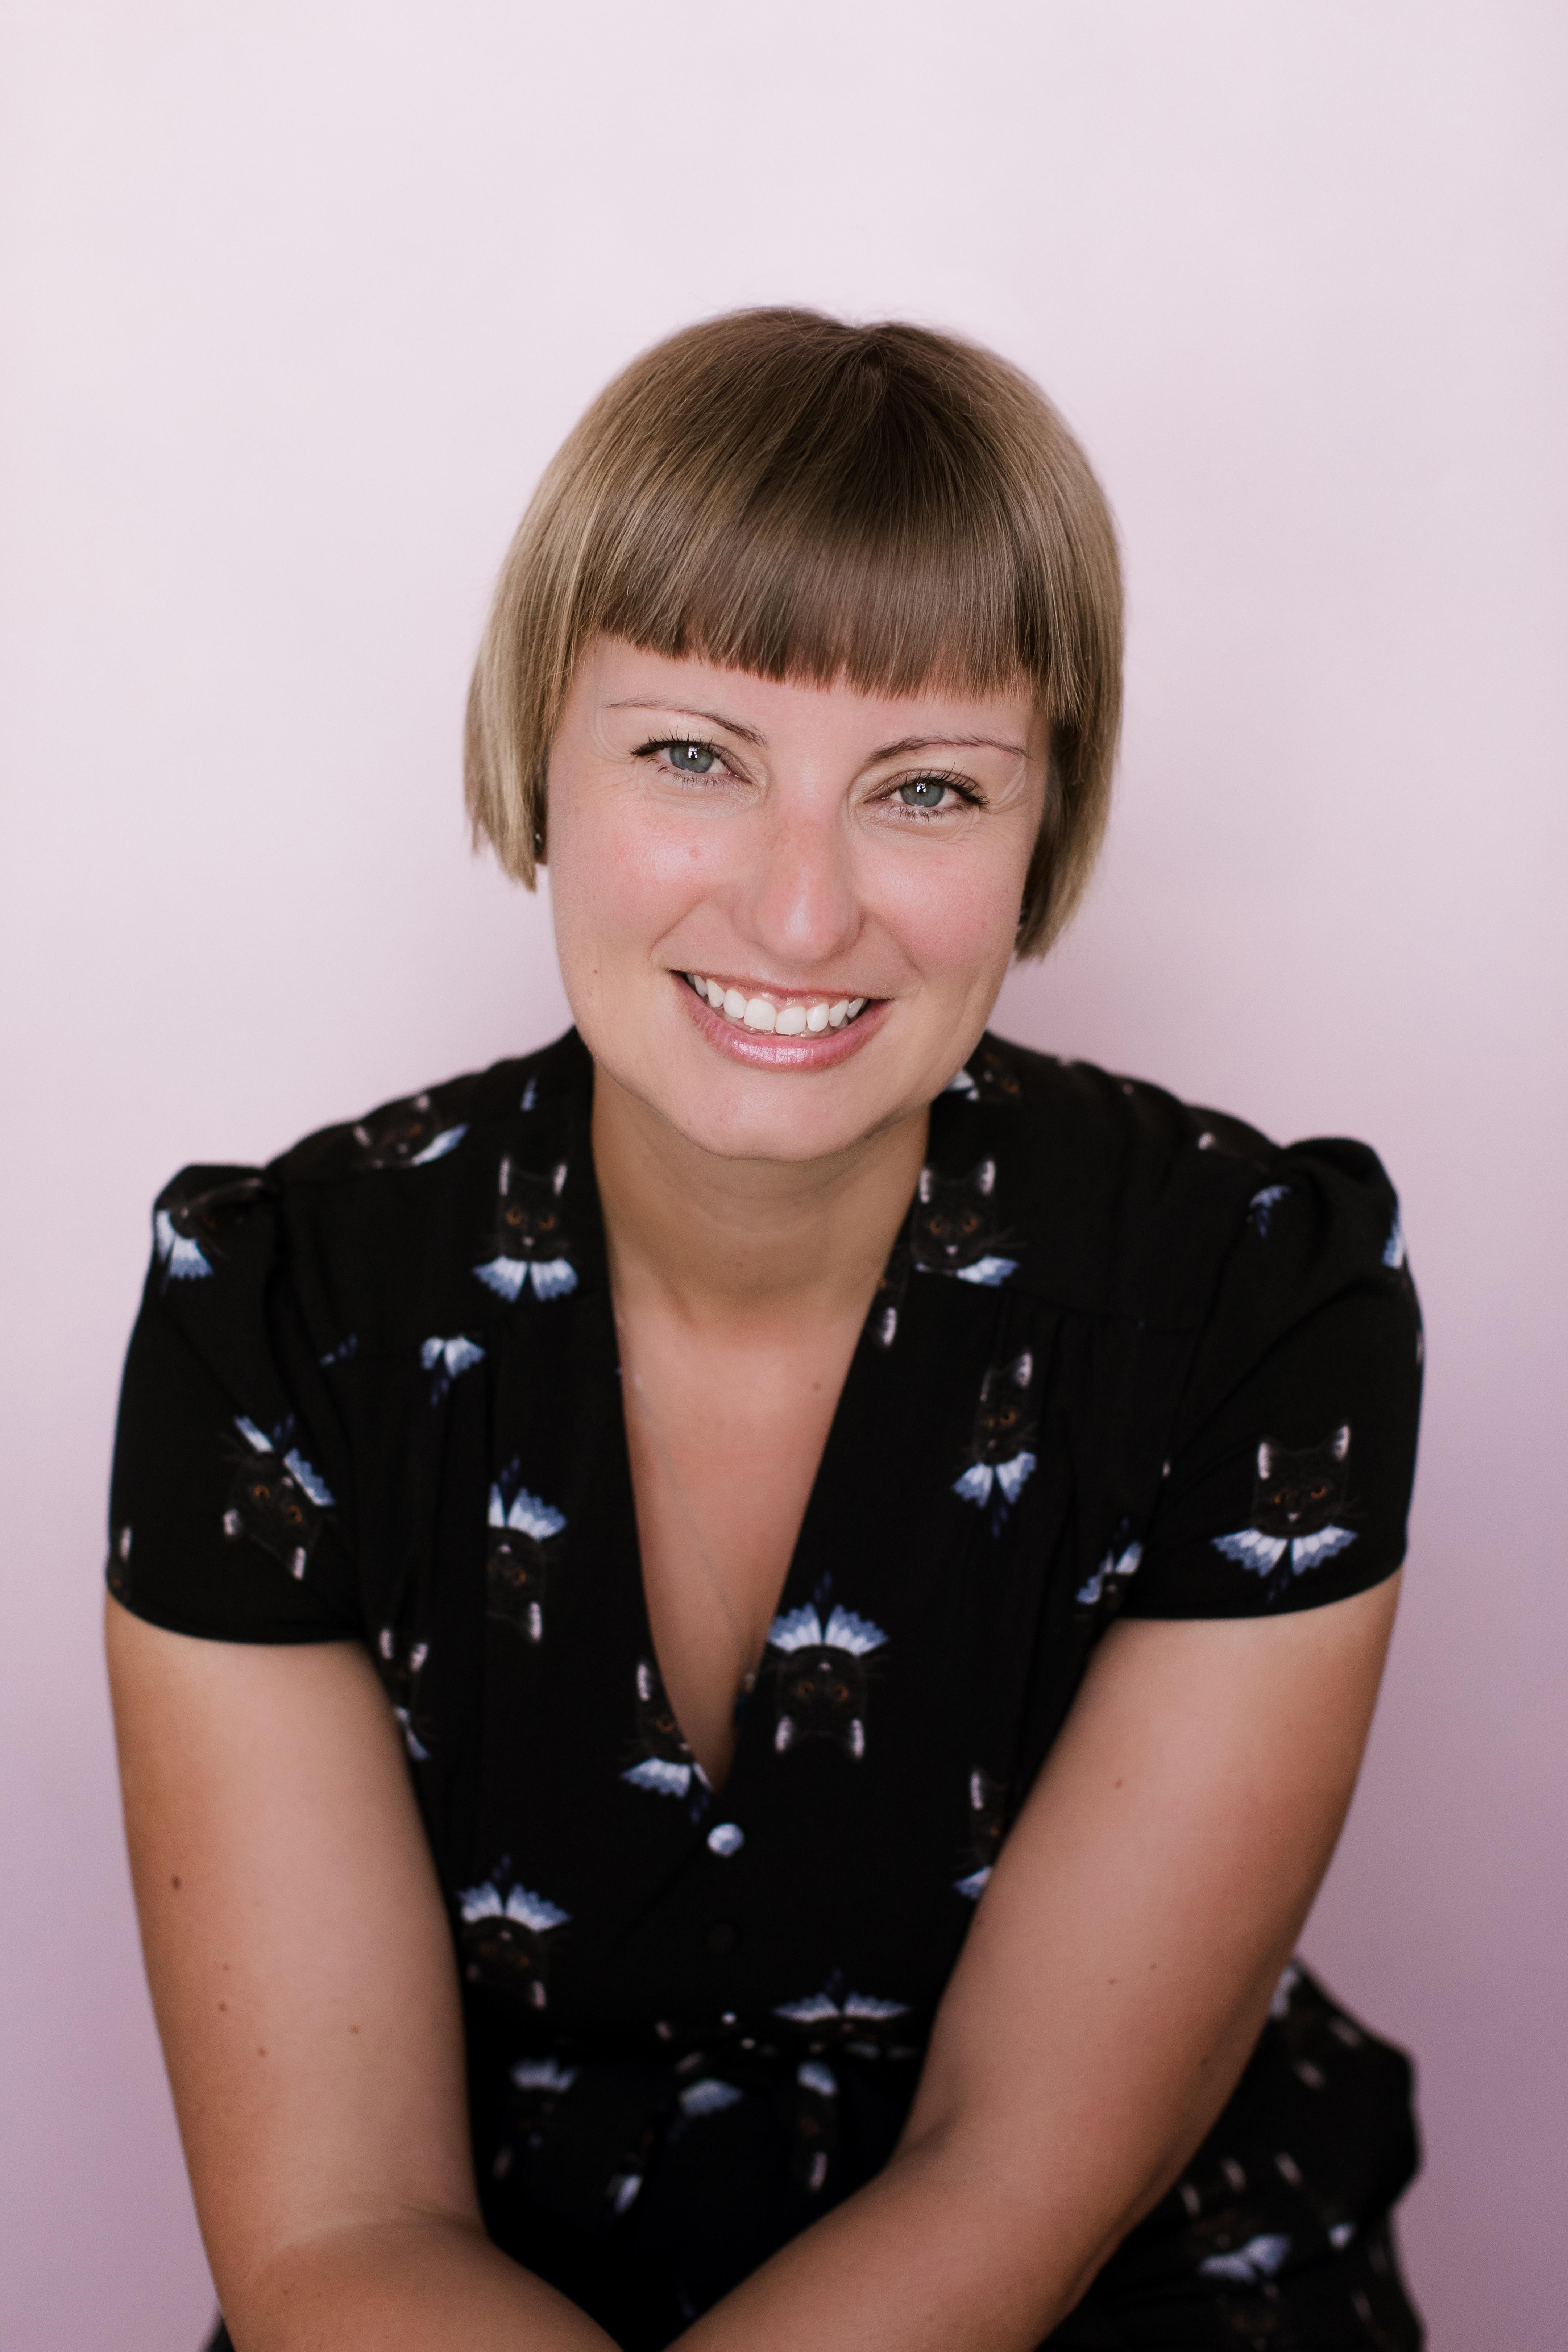 Courtney Beck